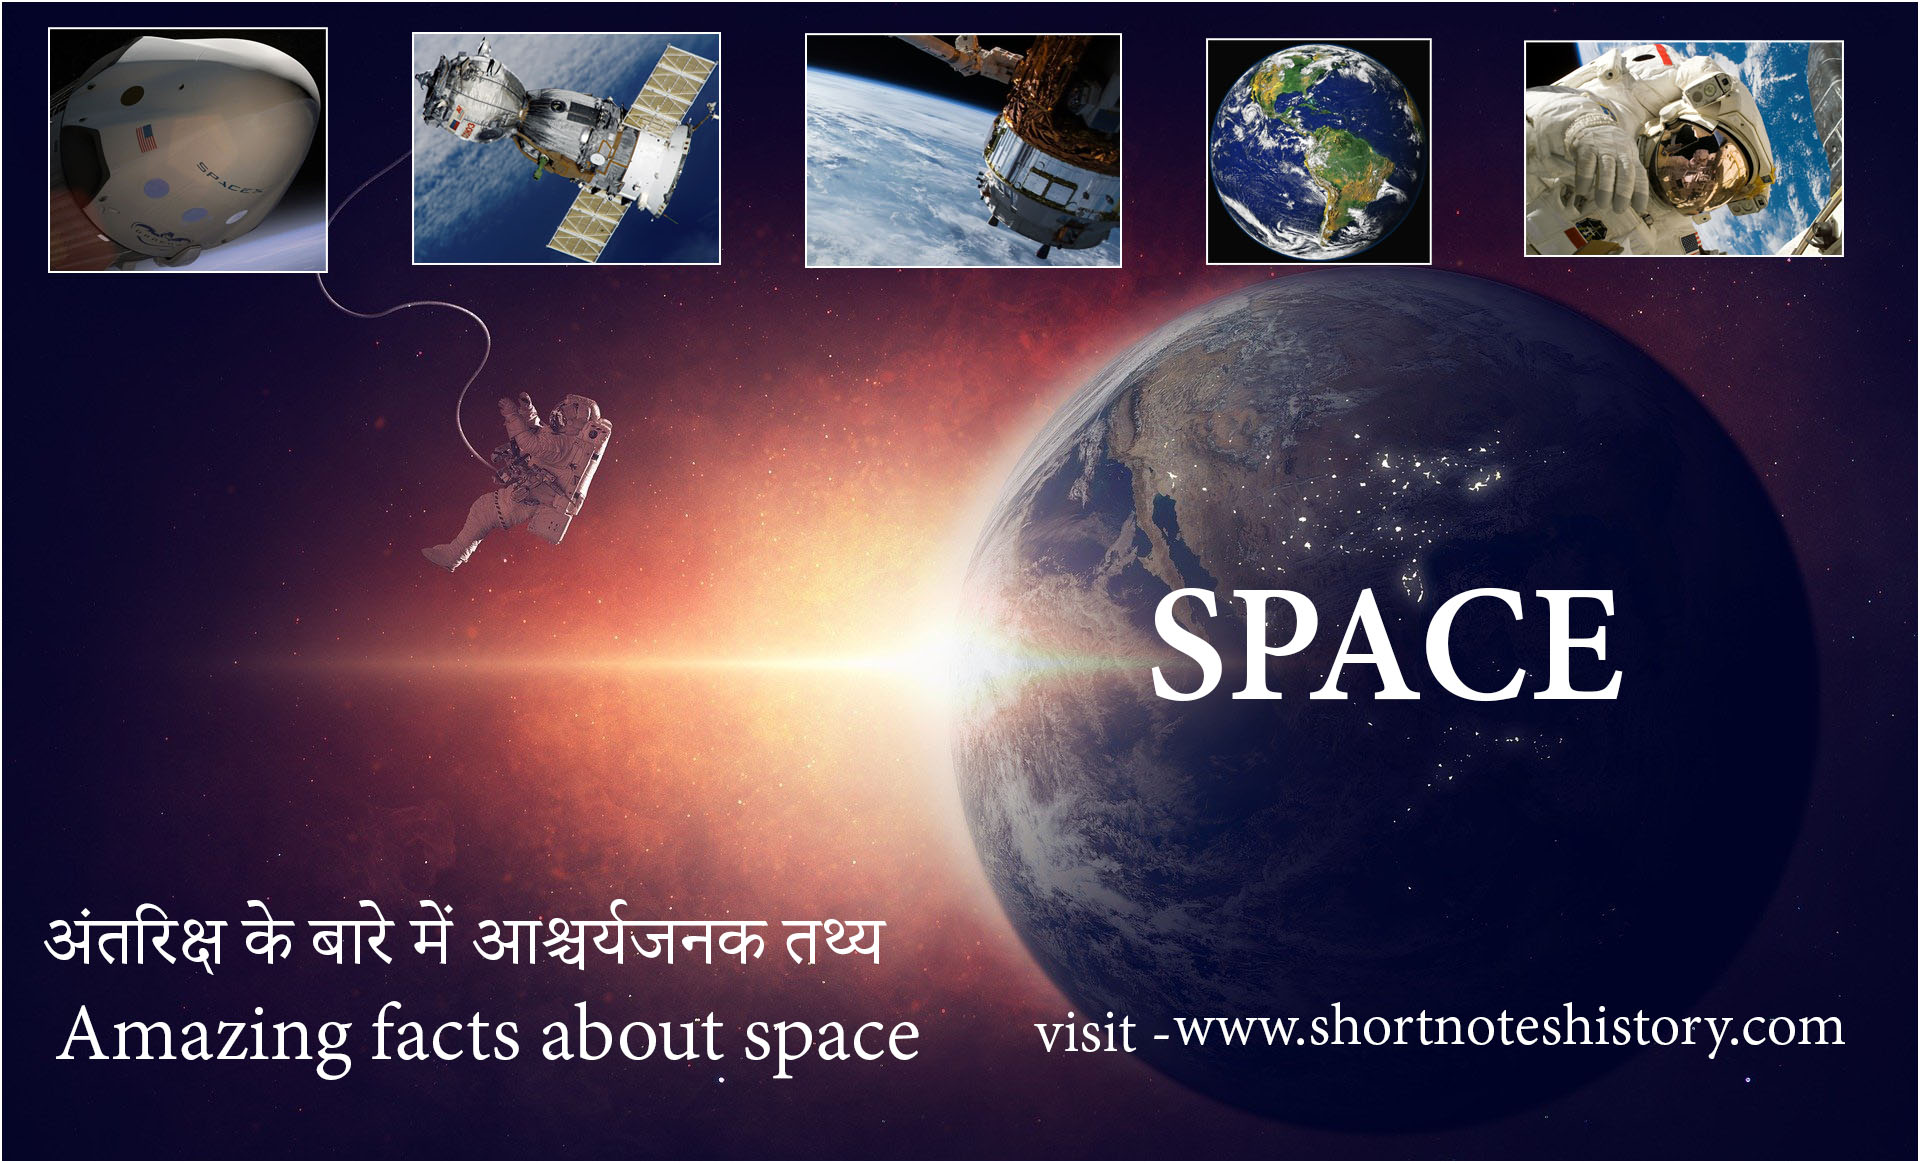 Amazing facts about space in Hindi [अंतरिक्ष के बारे में आश्चर्यजनक तथ्य]